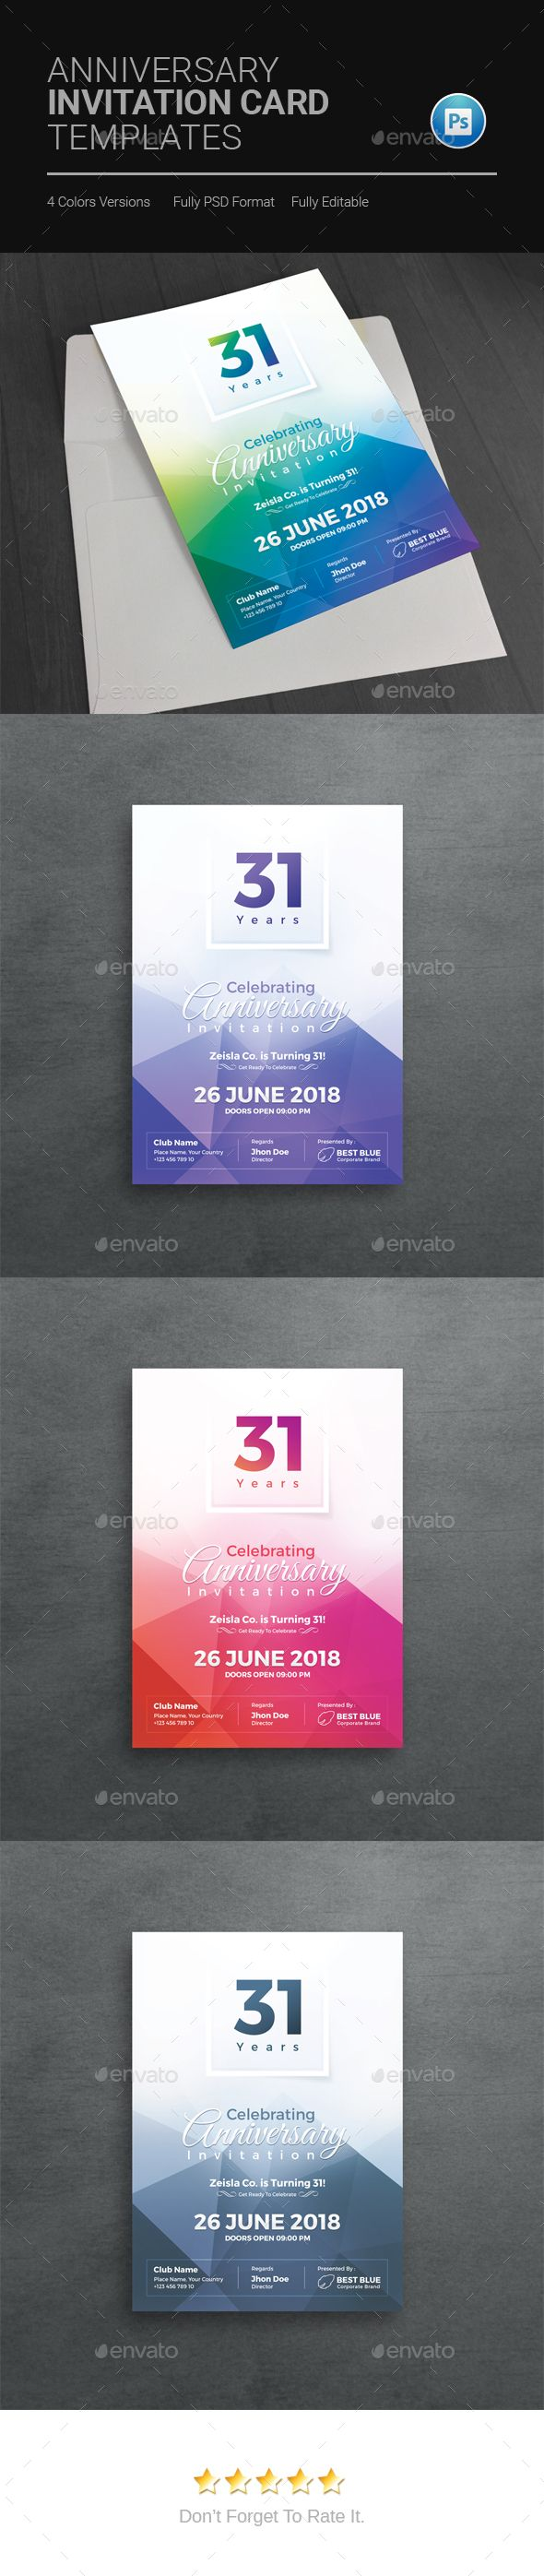 144 best invitation card templates images on pinterest card anniversary invitation by artbeta stopboris Images